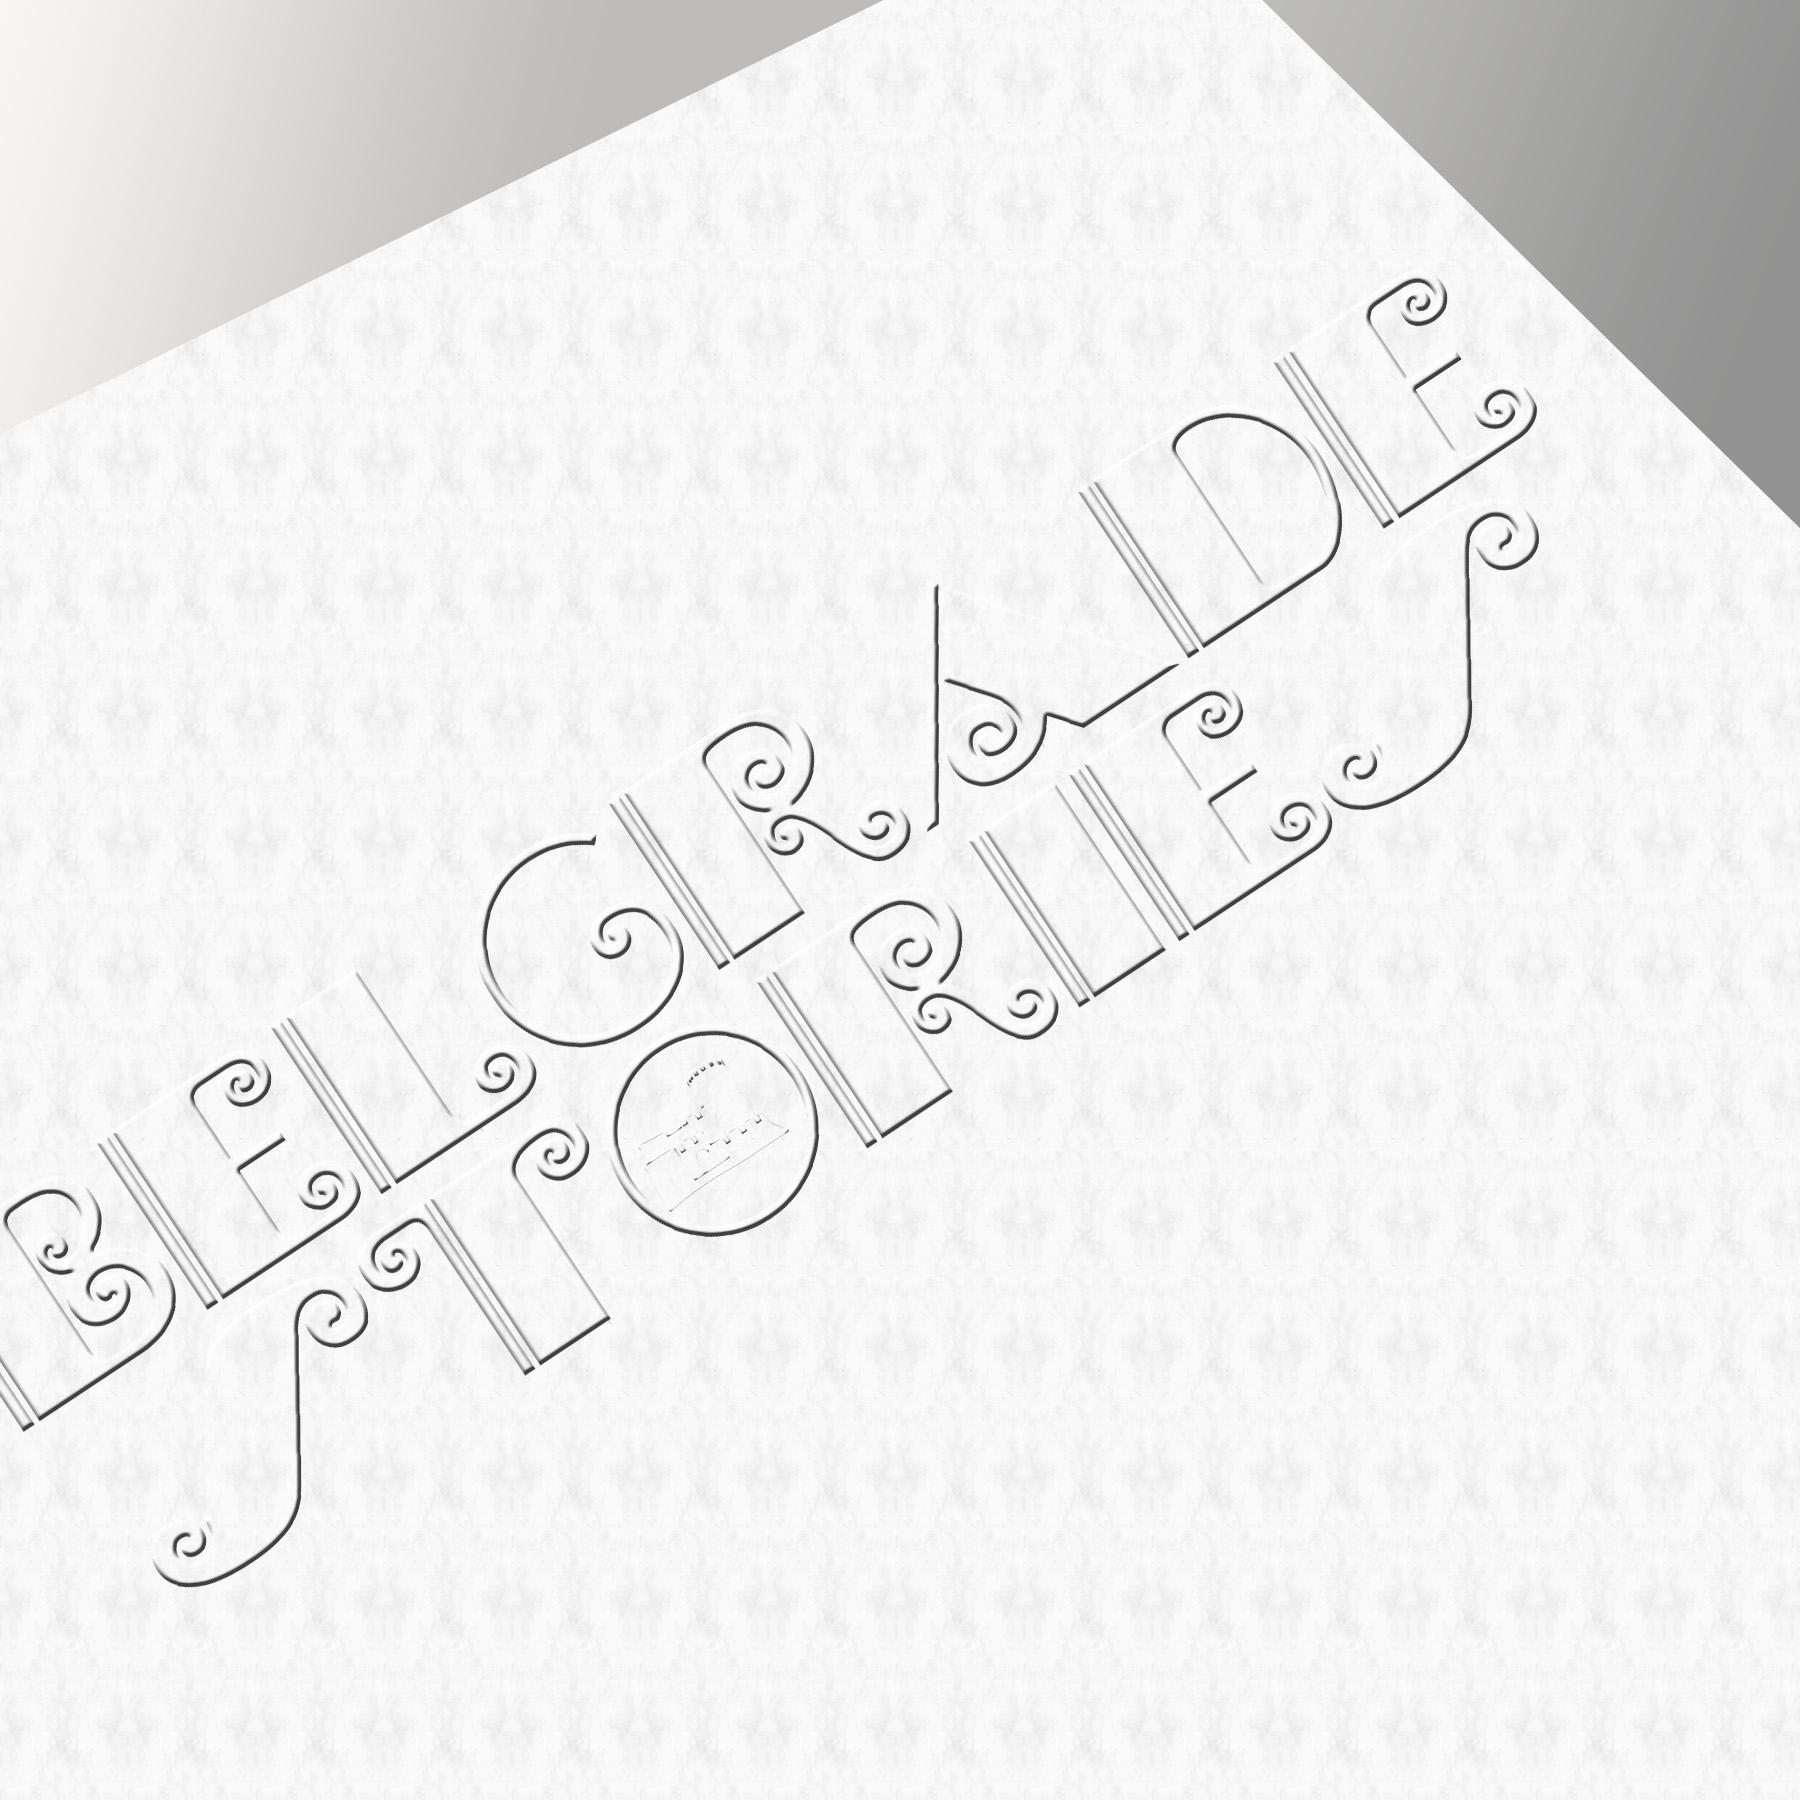 Логотип для агентства городских туров в Белграде фото f_010589261e4d92bc.jpg